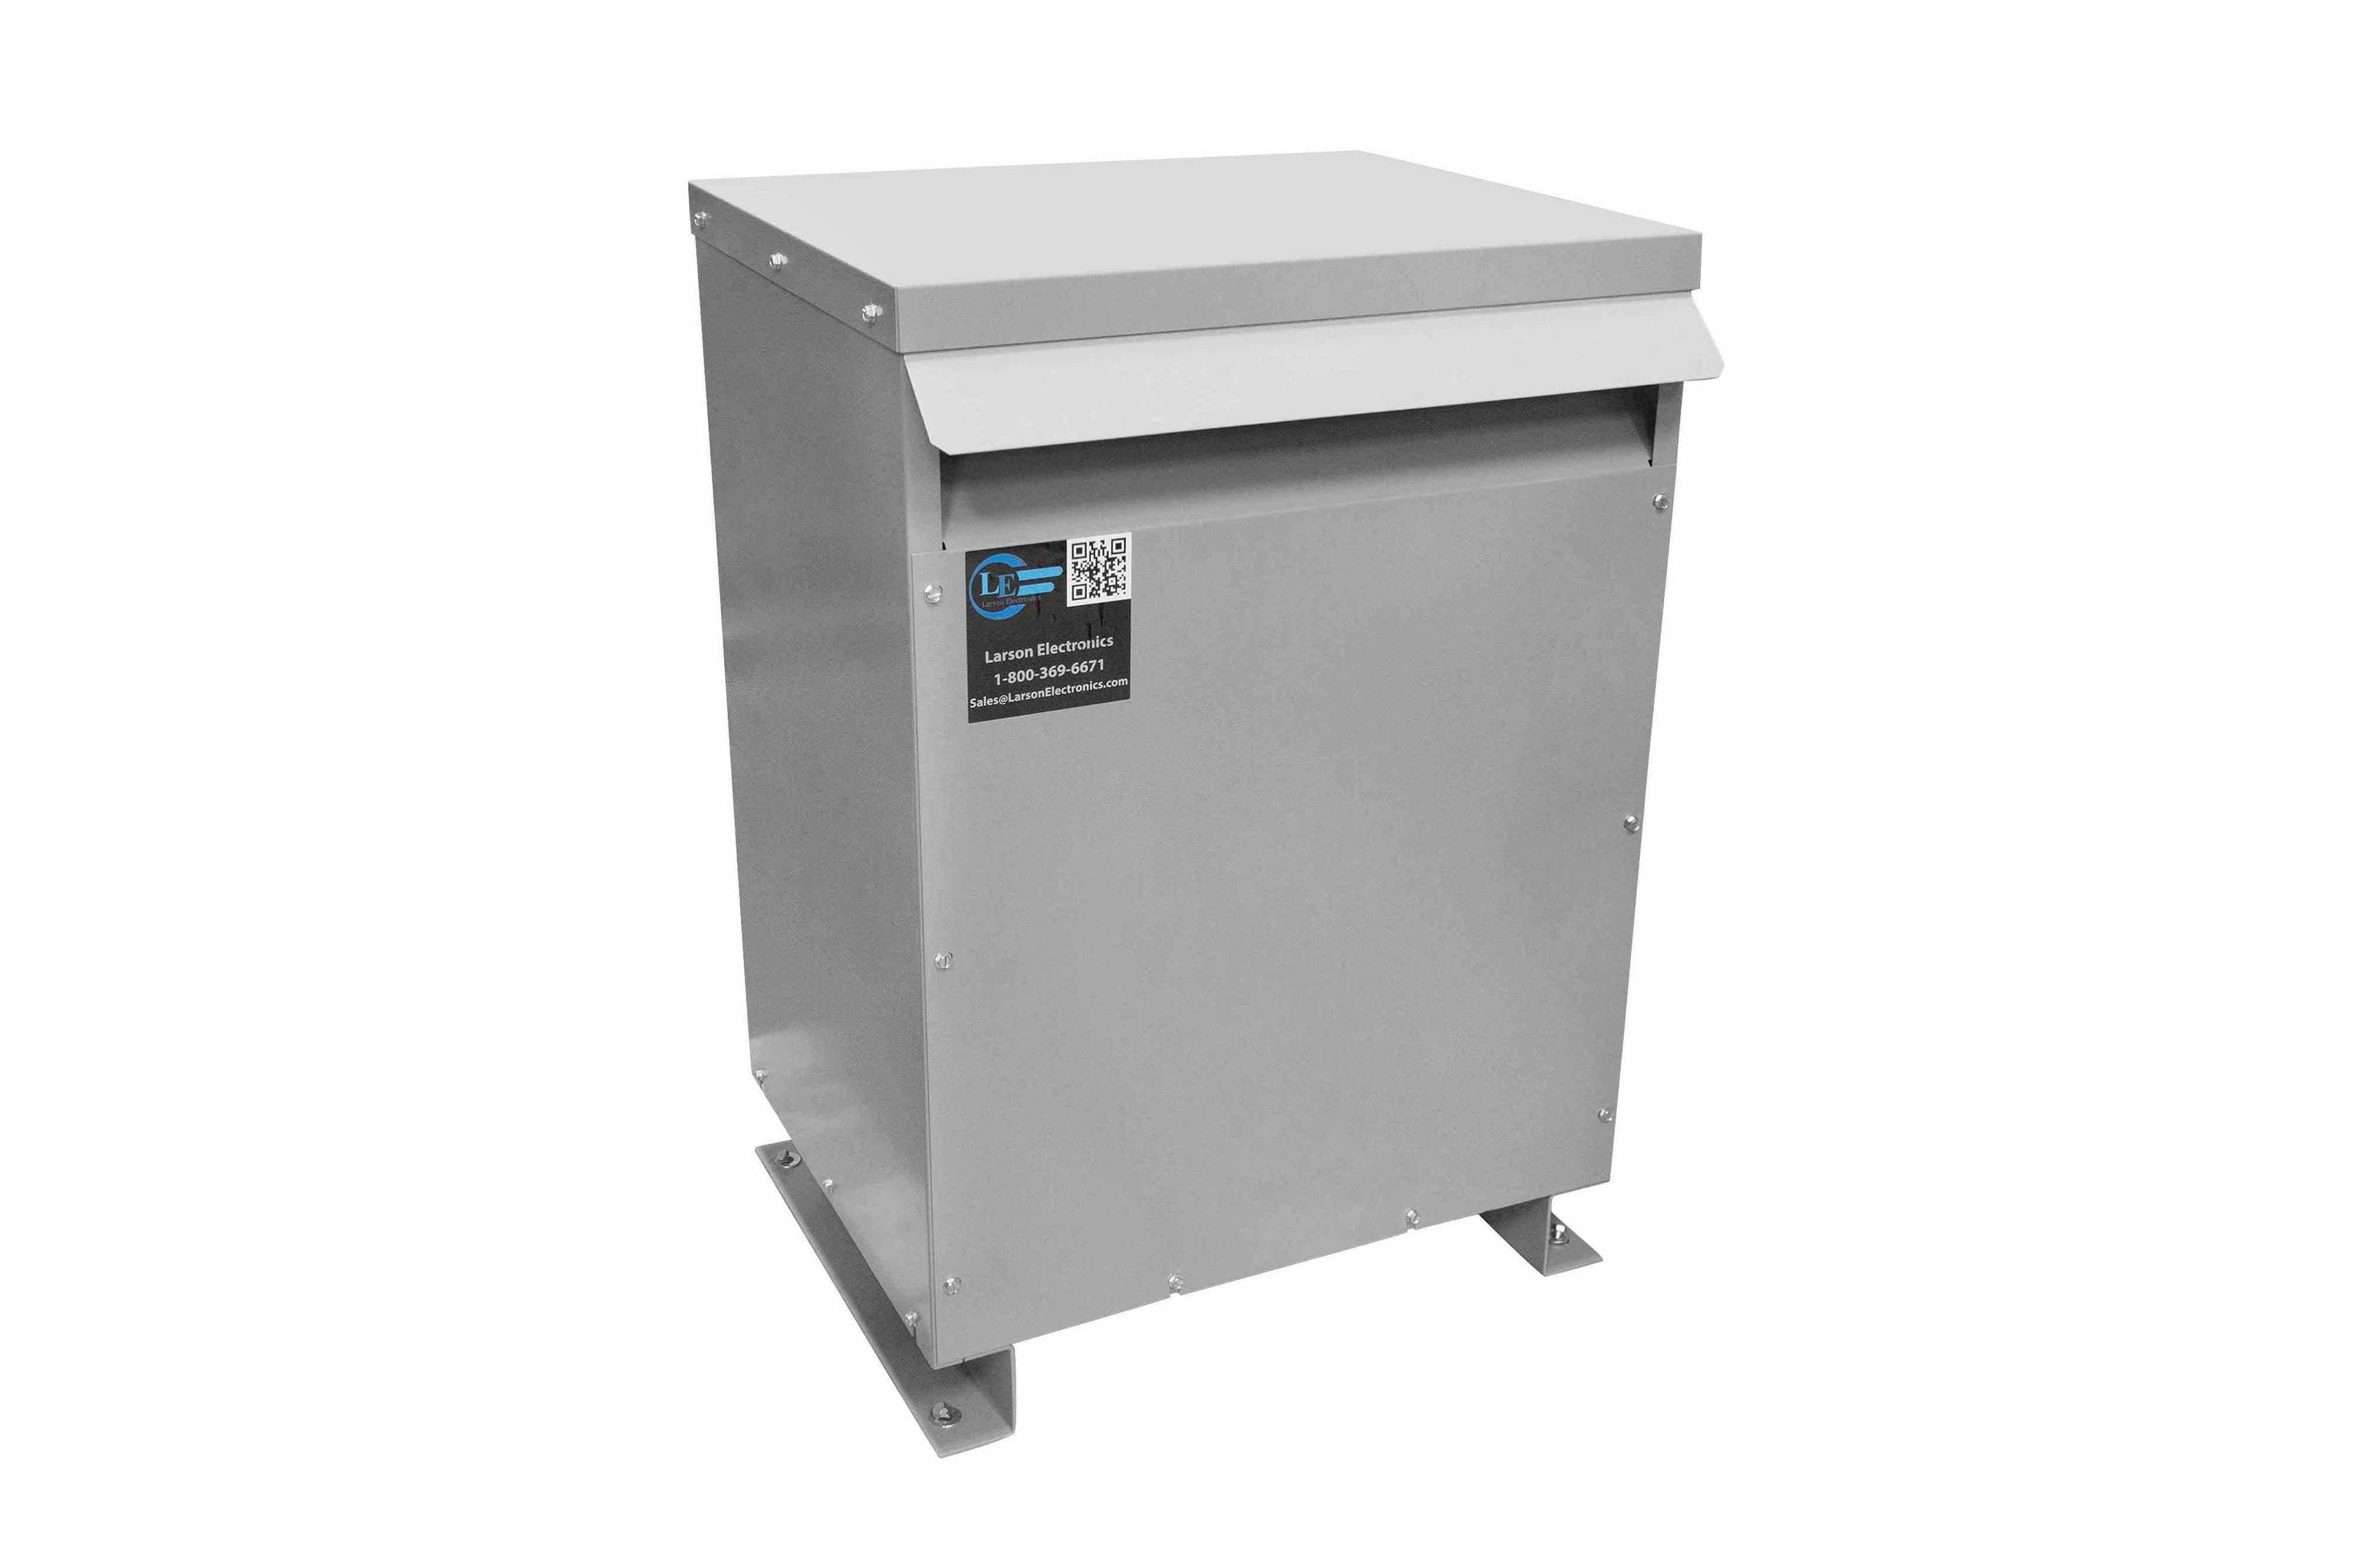 112.5 kVA 3PH Isolation Transformer, 220V Wye Primary, 480Y/277 Wye-N Secondary, N3R, Ventilated, 60 Hz